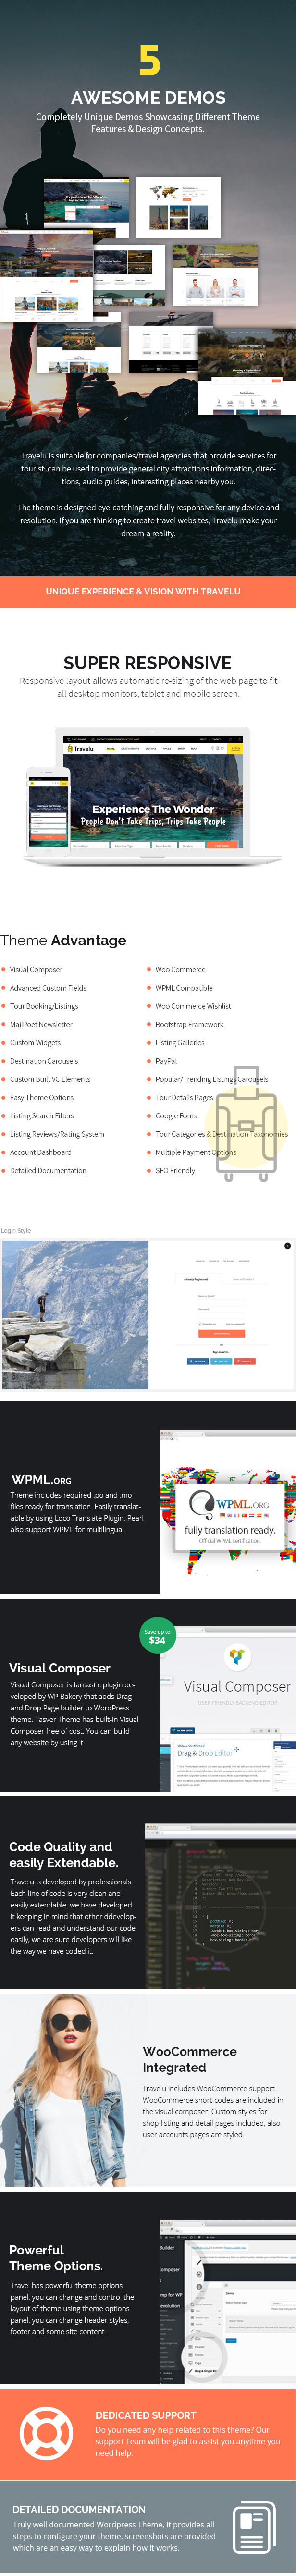 Efora - Travel, Tour Booking and Travel Agency WordPress Theme - 5